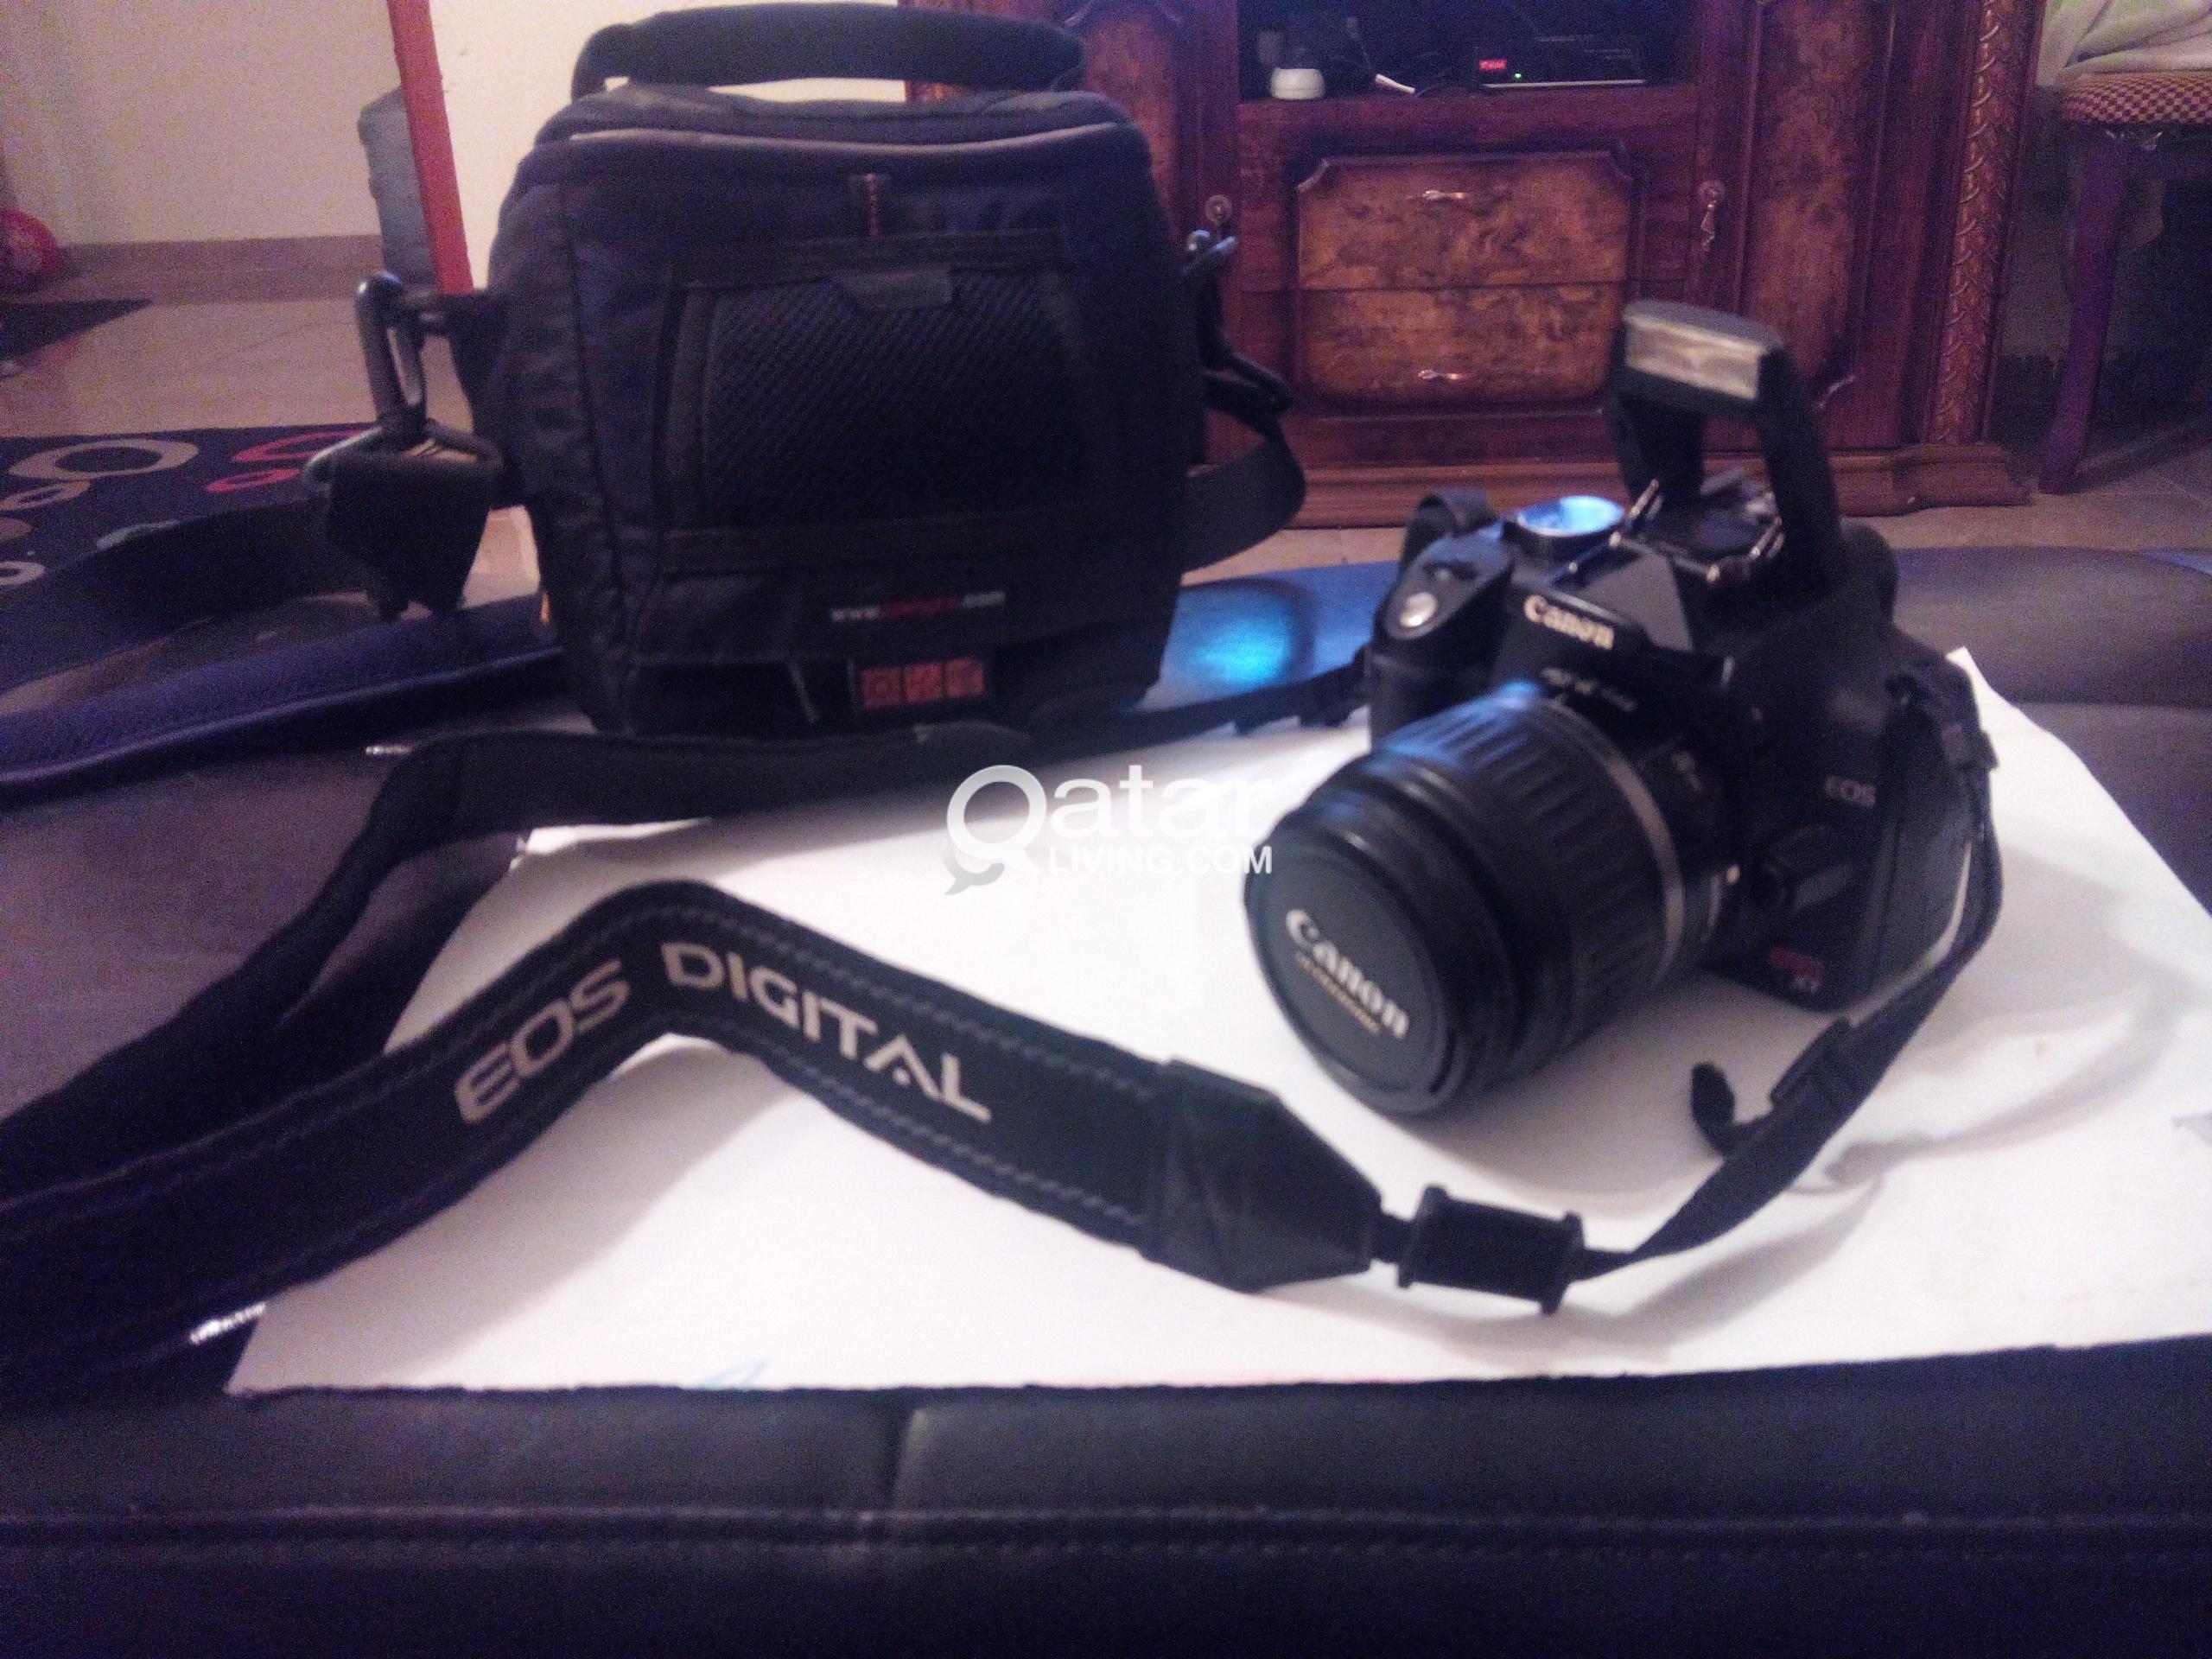 Canon EOS 350D / Digital Rebel XT | Qatar Living